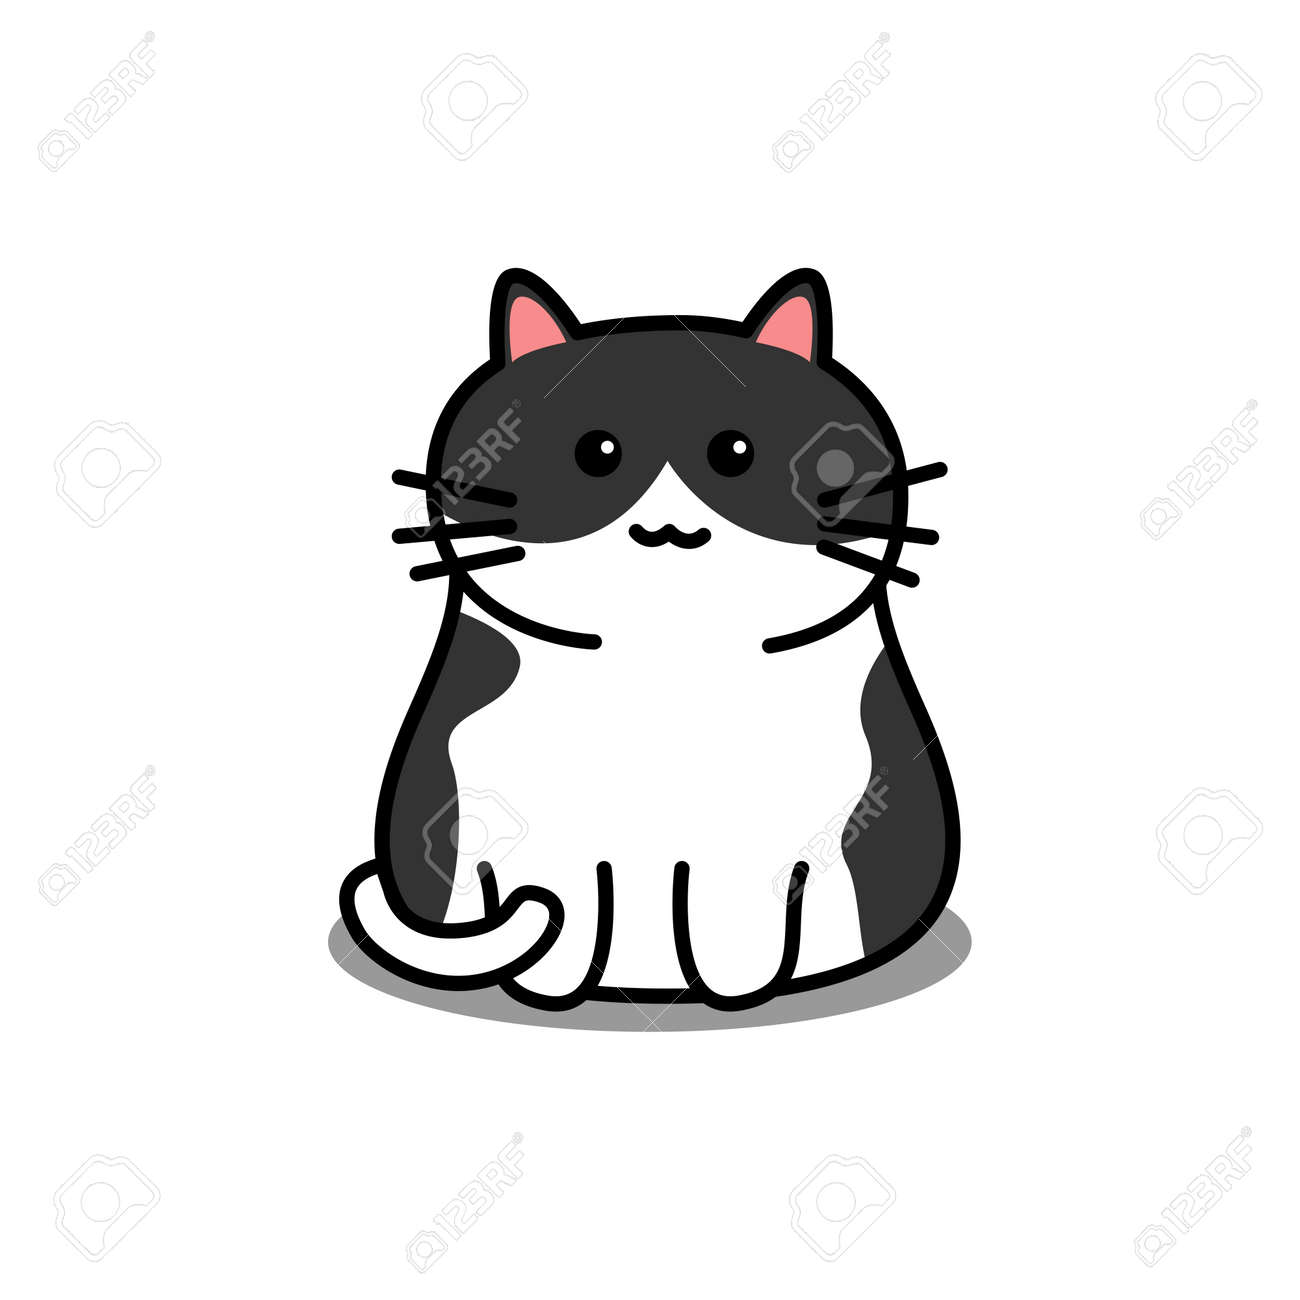 Cute black and white cat cartoon, vector illustration - 169151626